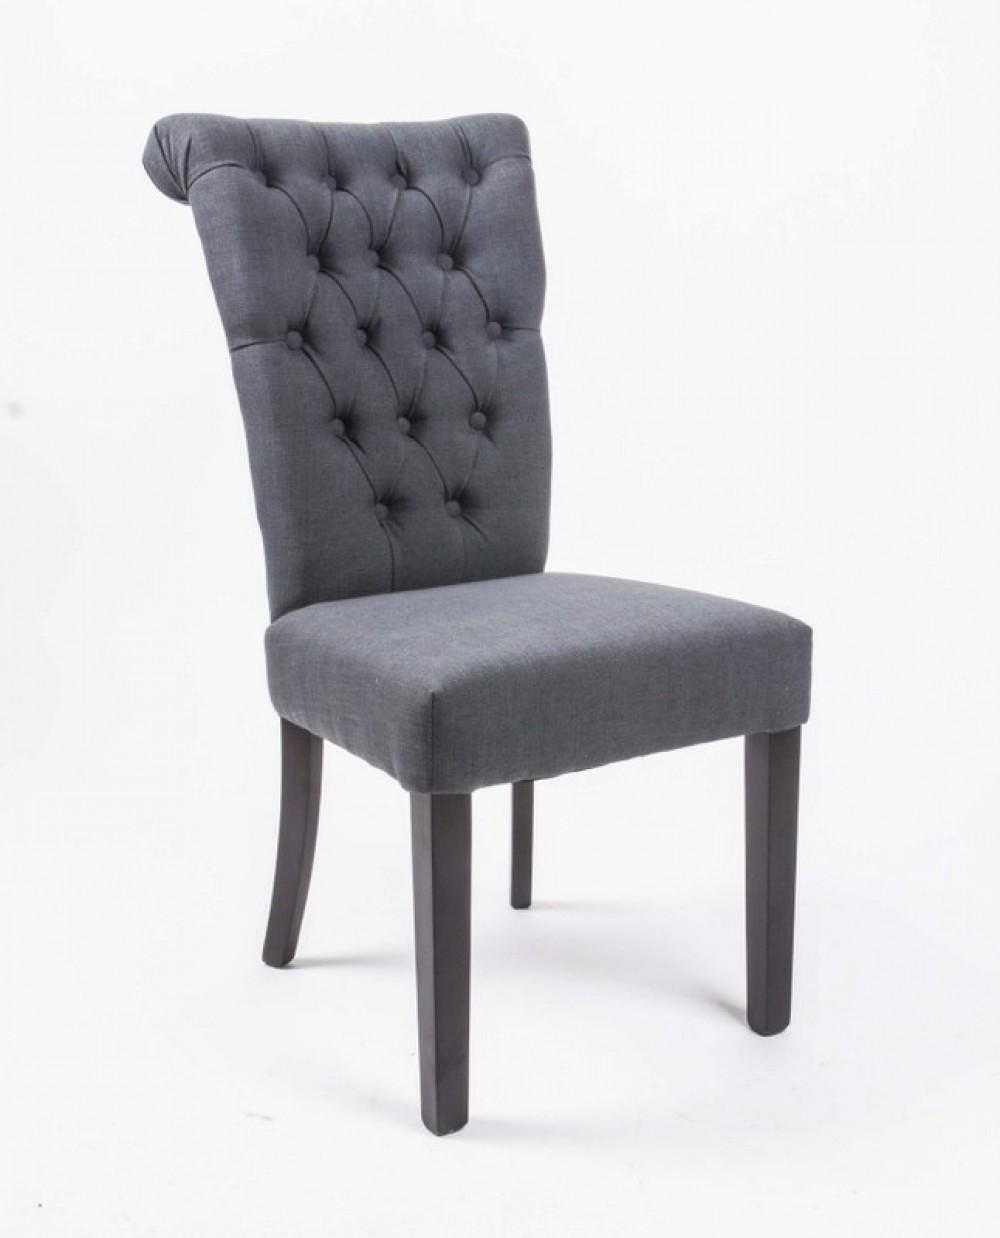 stuhl gepolstert anthrazit stuhl chesterfield im. Black Bedroom Furniture Sets. Home Design Ideas